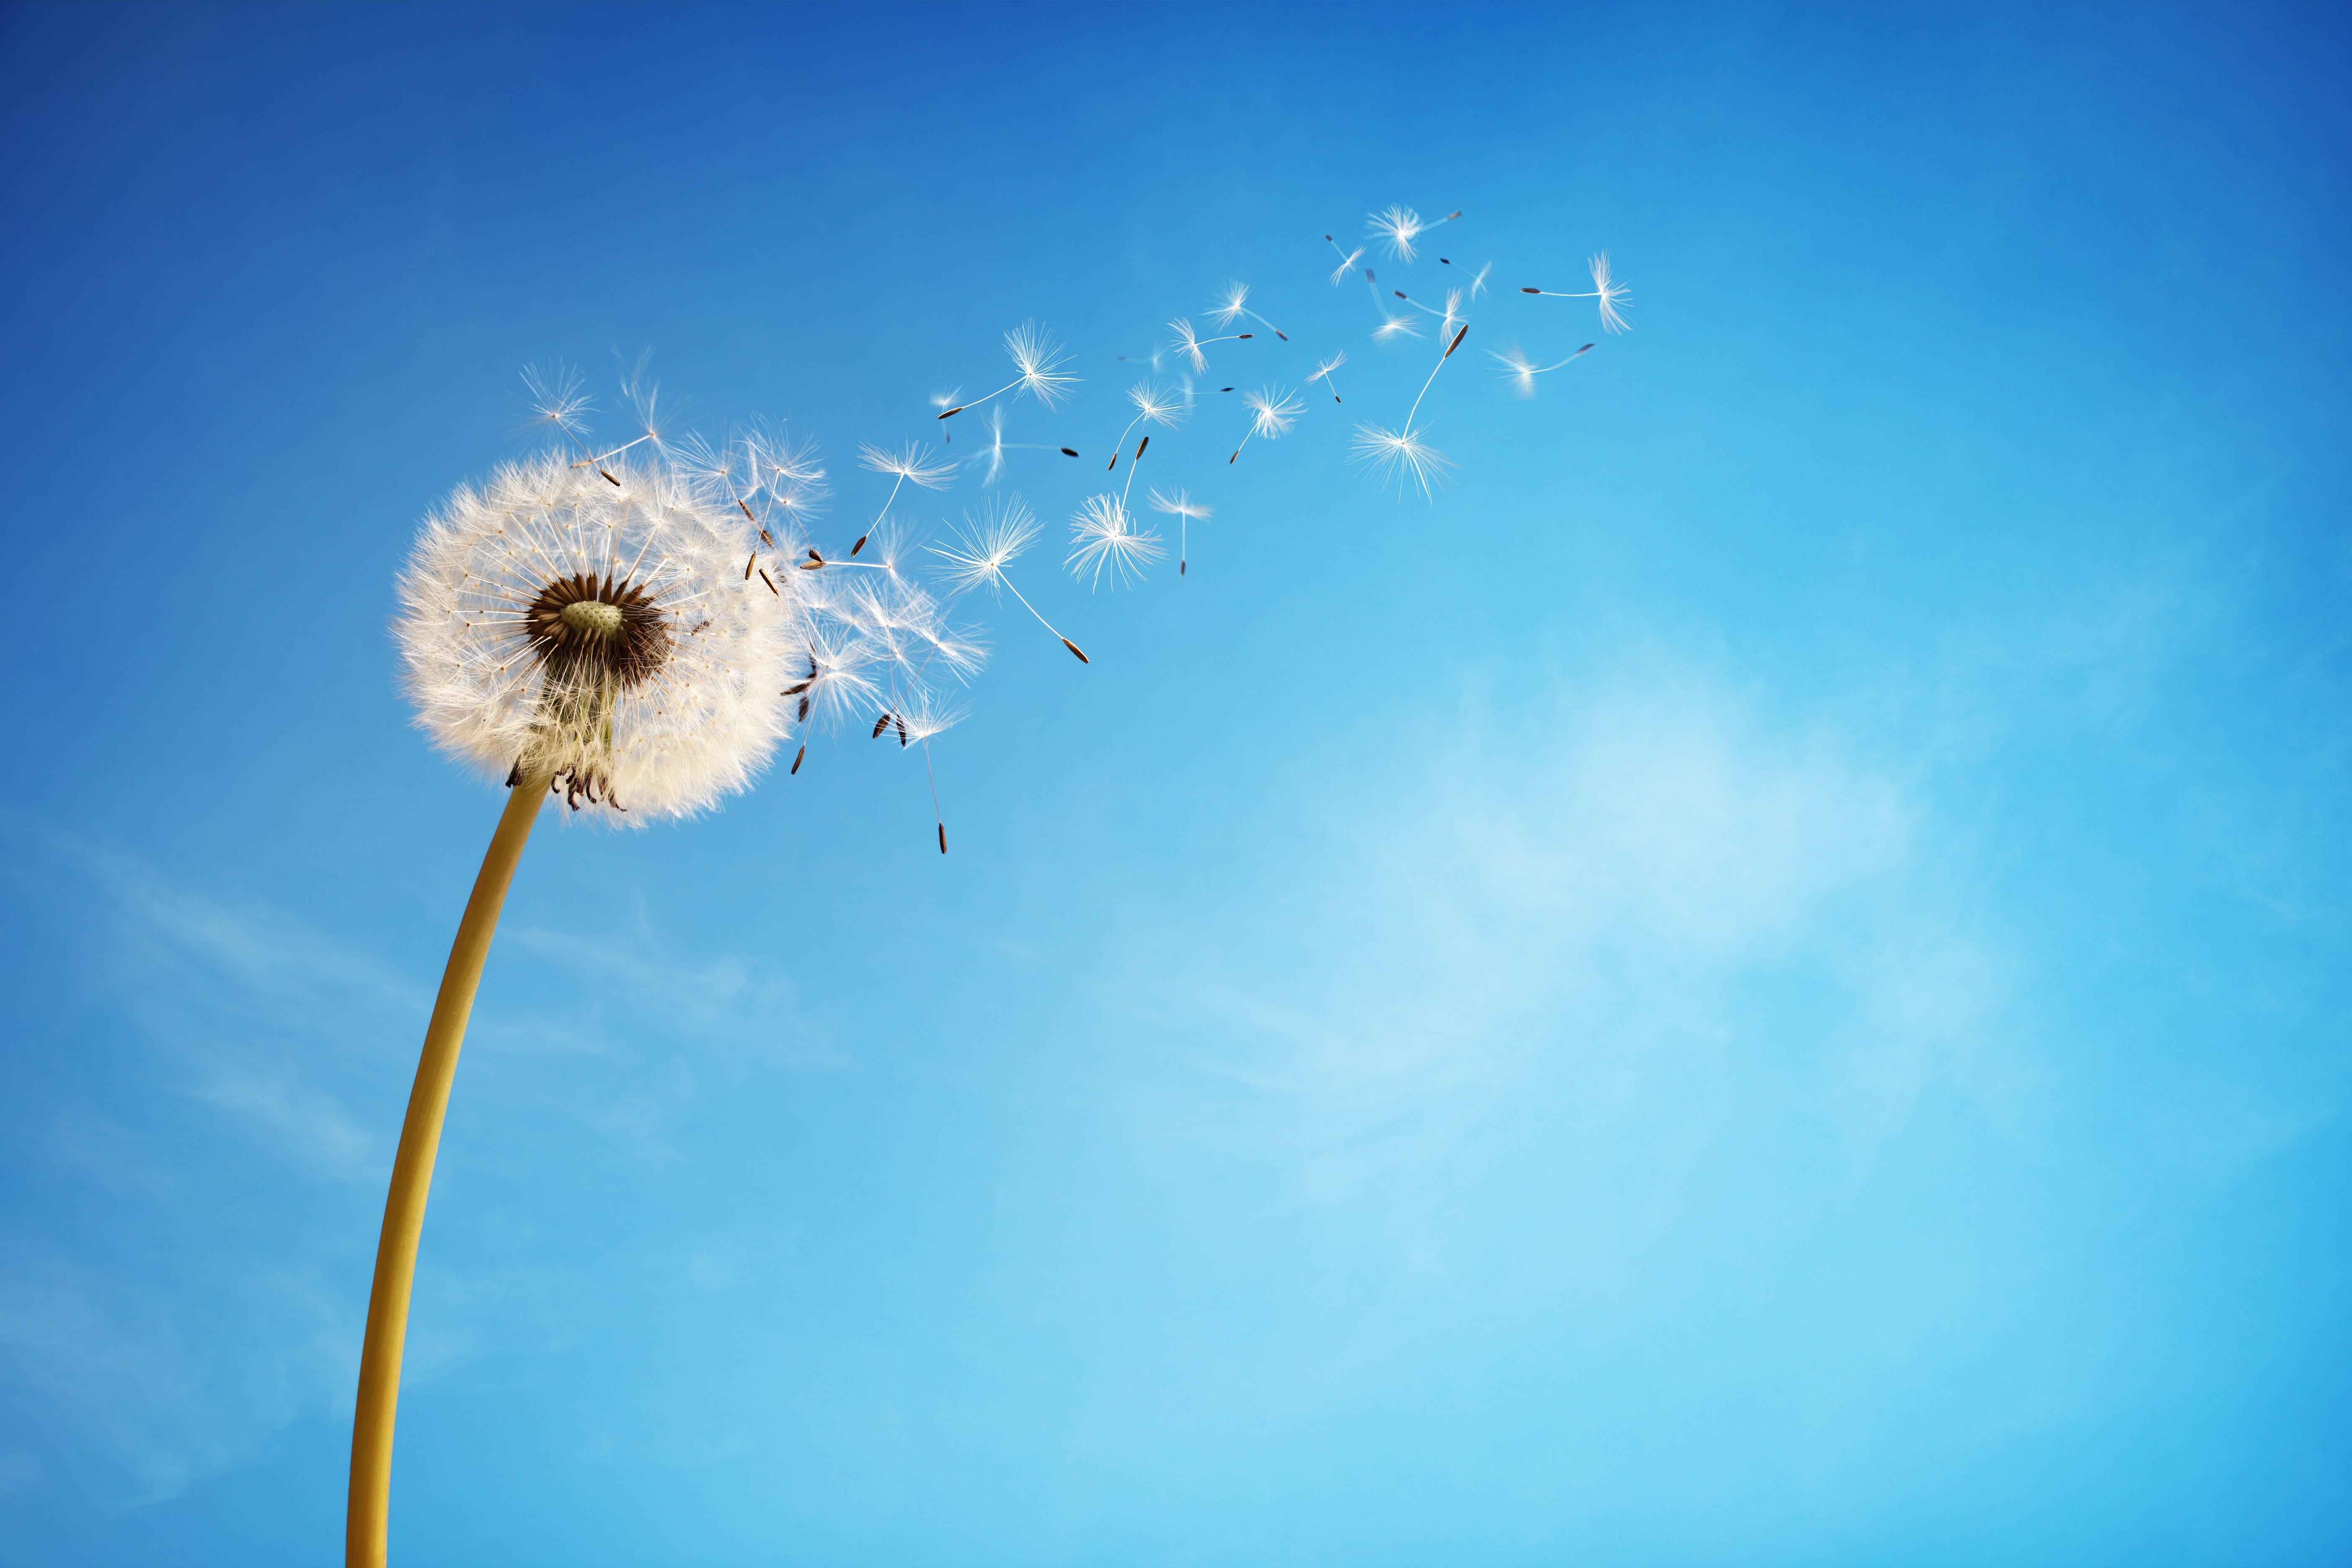 Sky dandelion flower background wallpaper | 5616x3744 | 849232